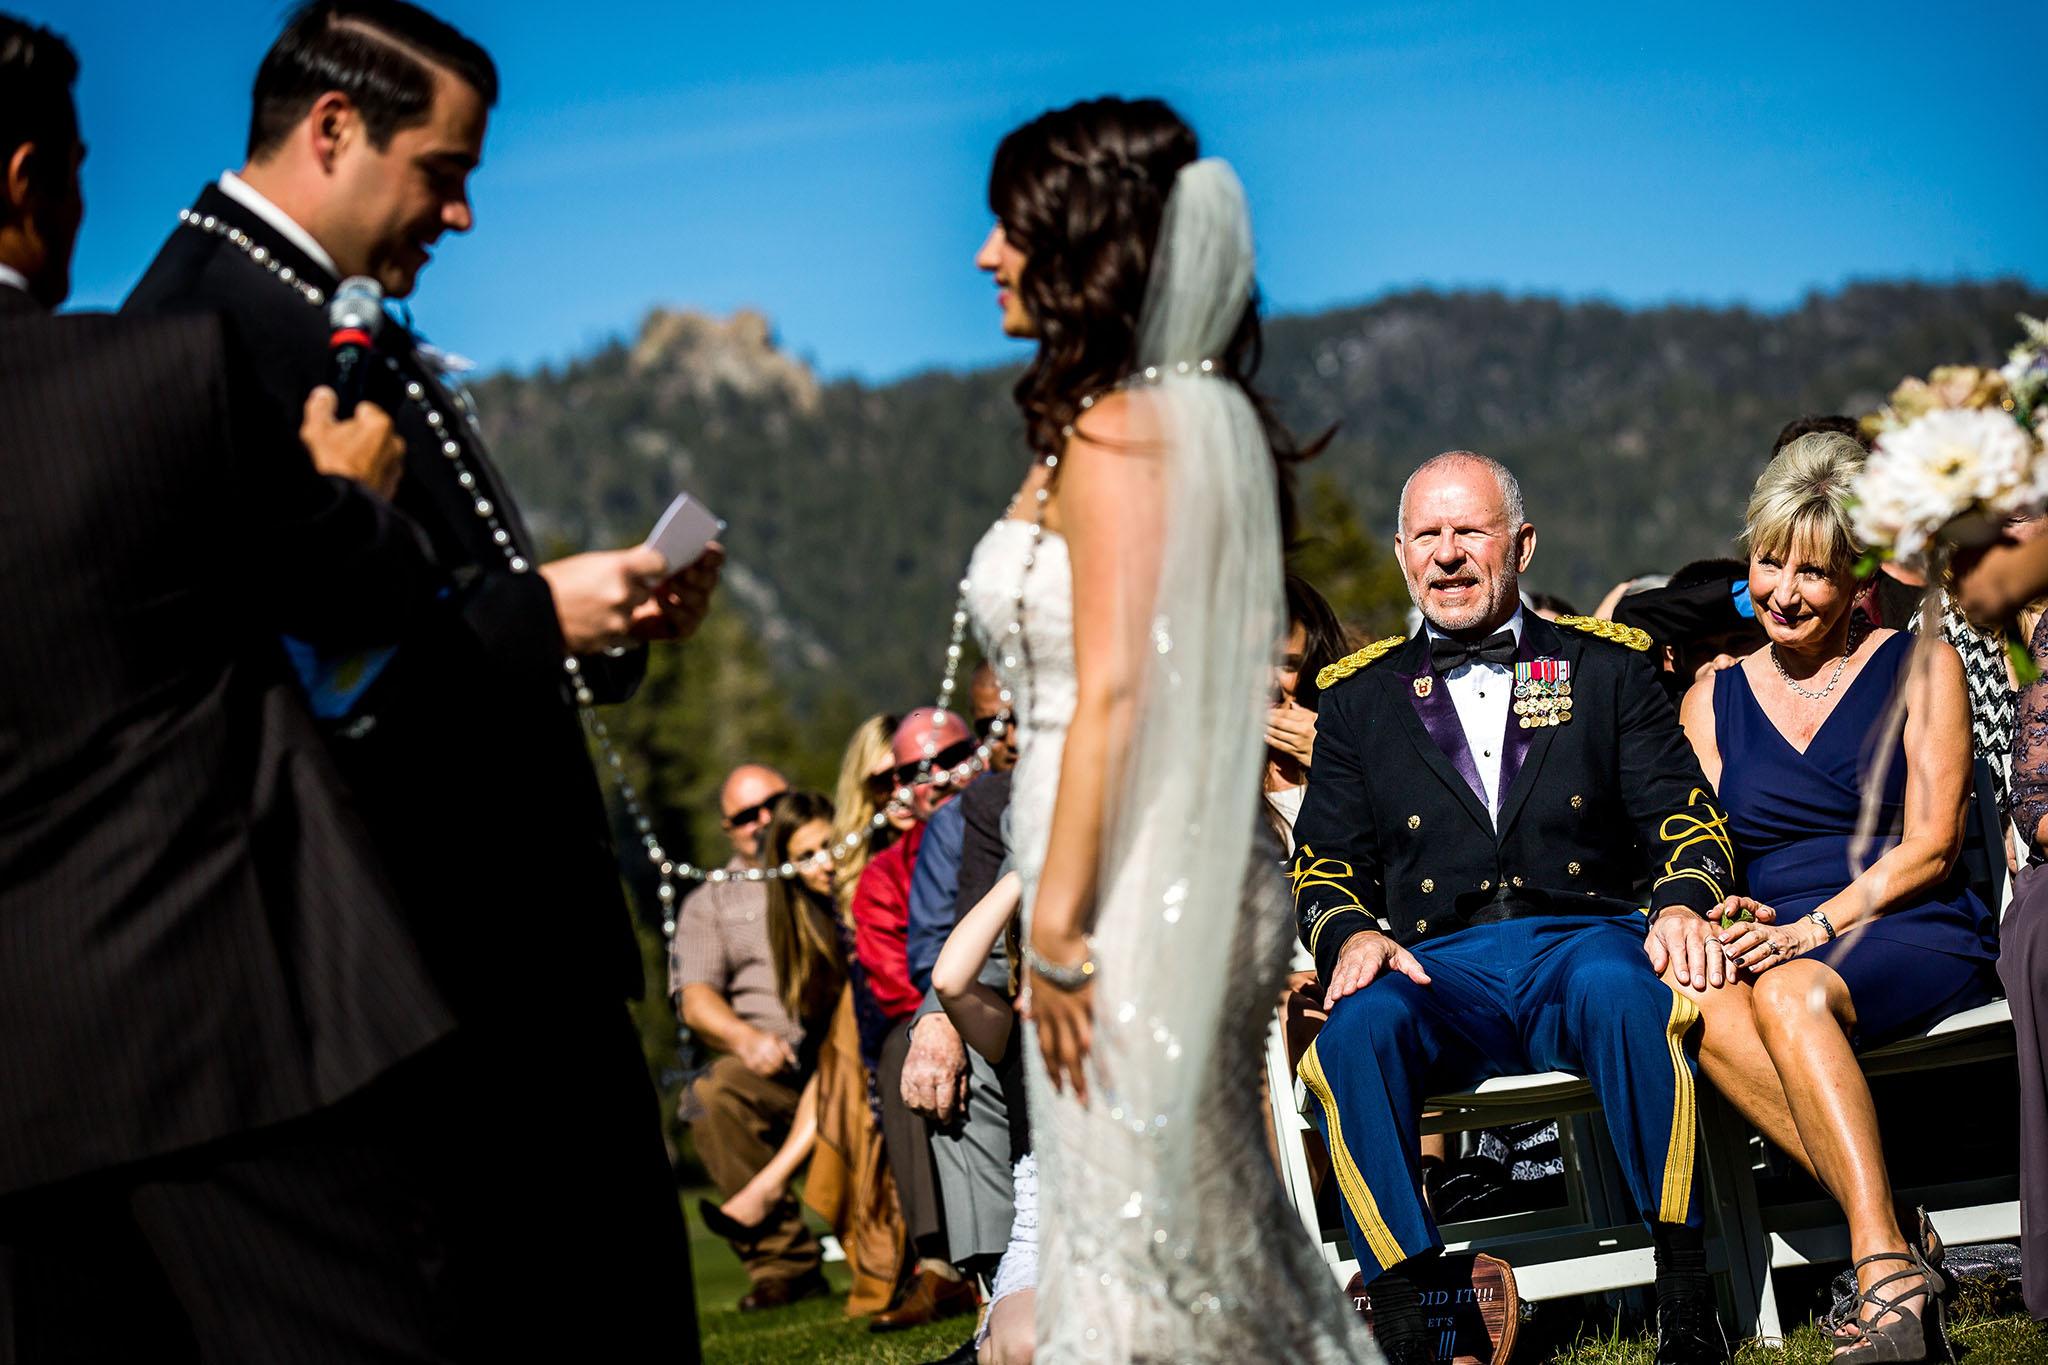 Kristal and Anthony's Edgewood wedding